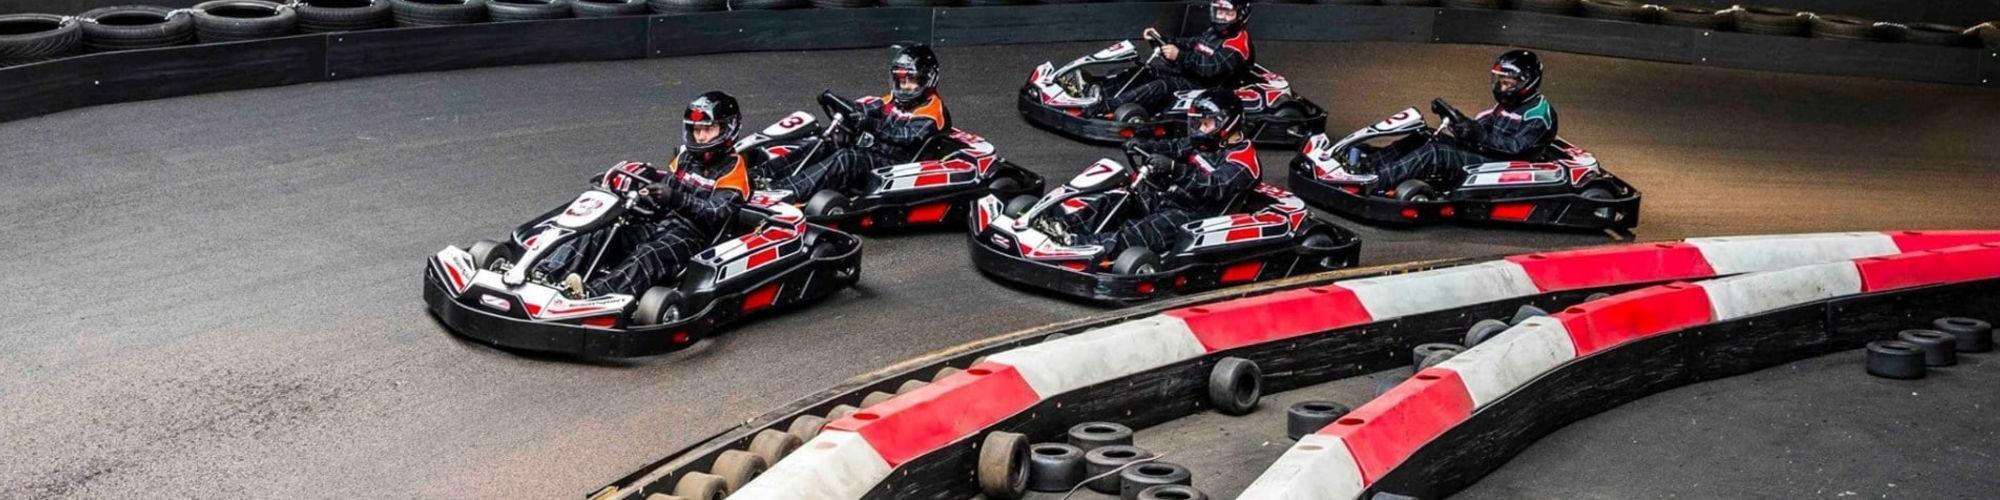 Fast Lane Indoor Kart Racing cover image